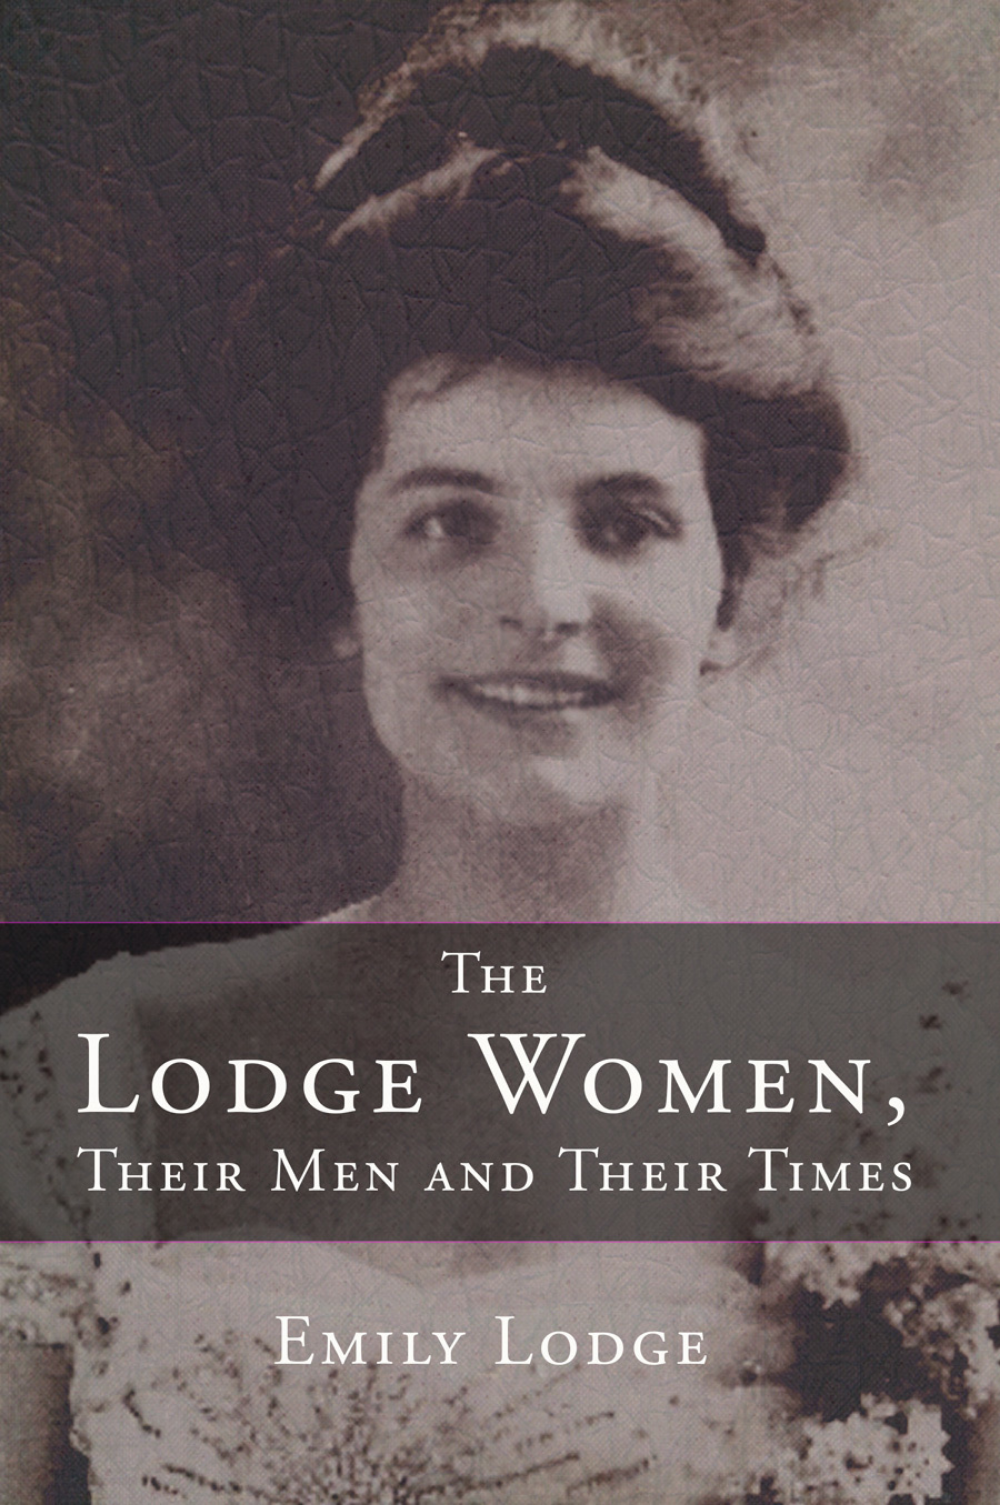 LodgeWomen-Cover-900pxW.jpg